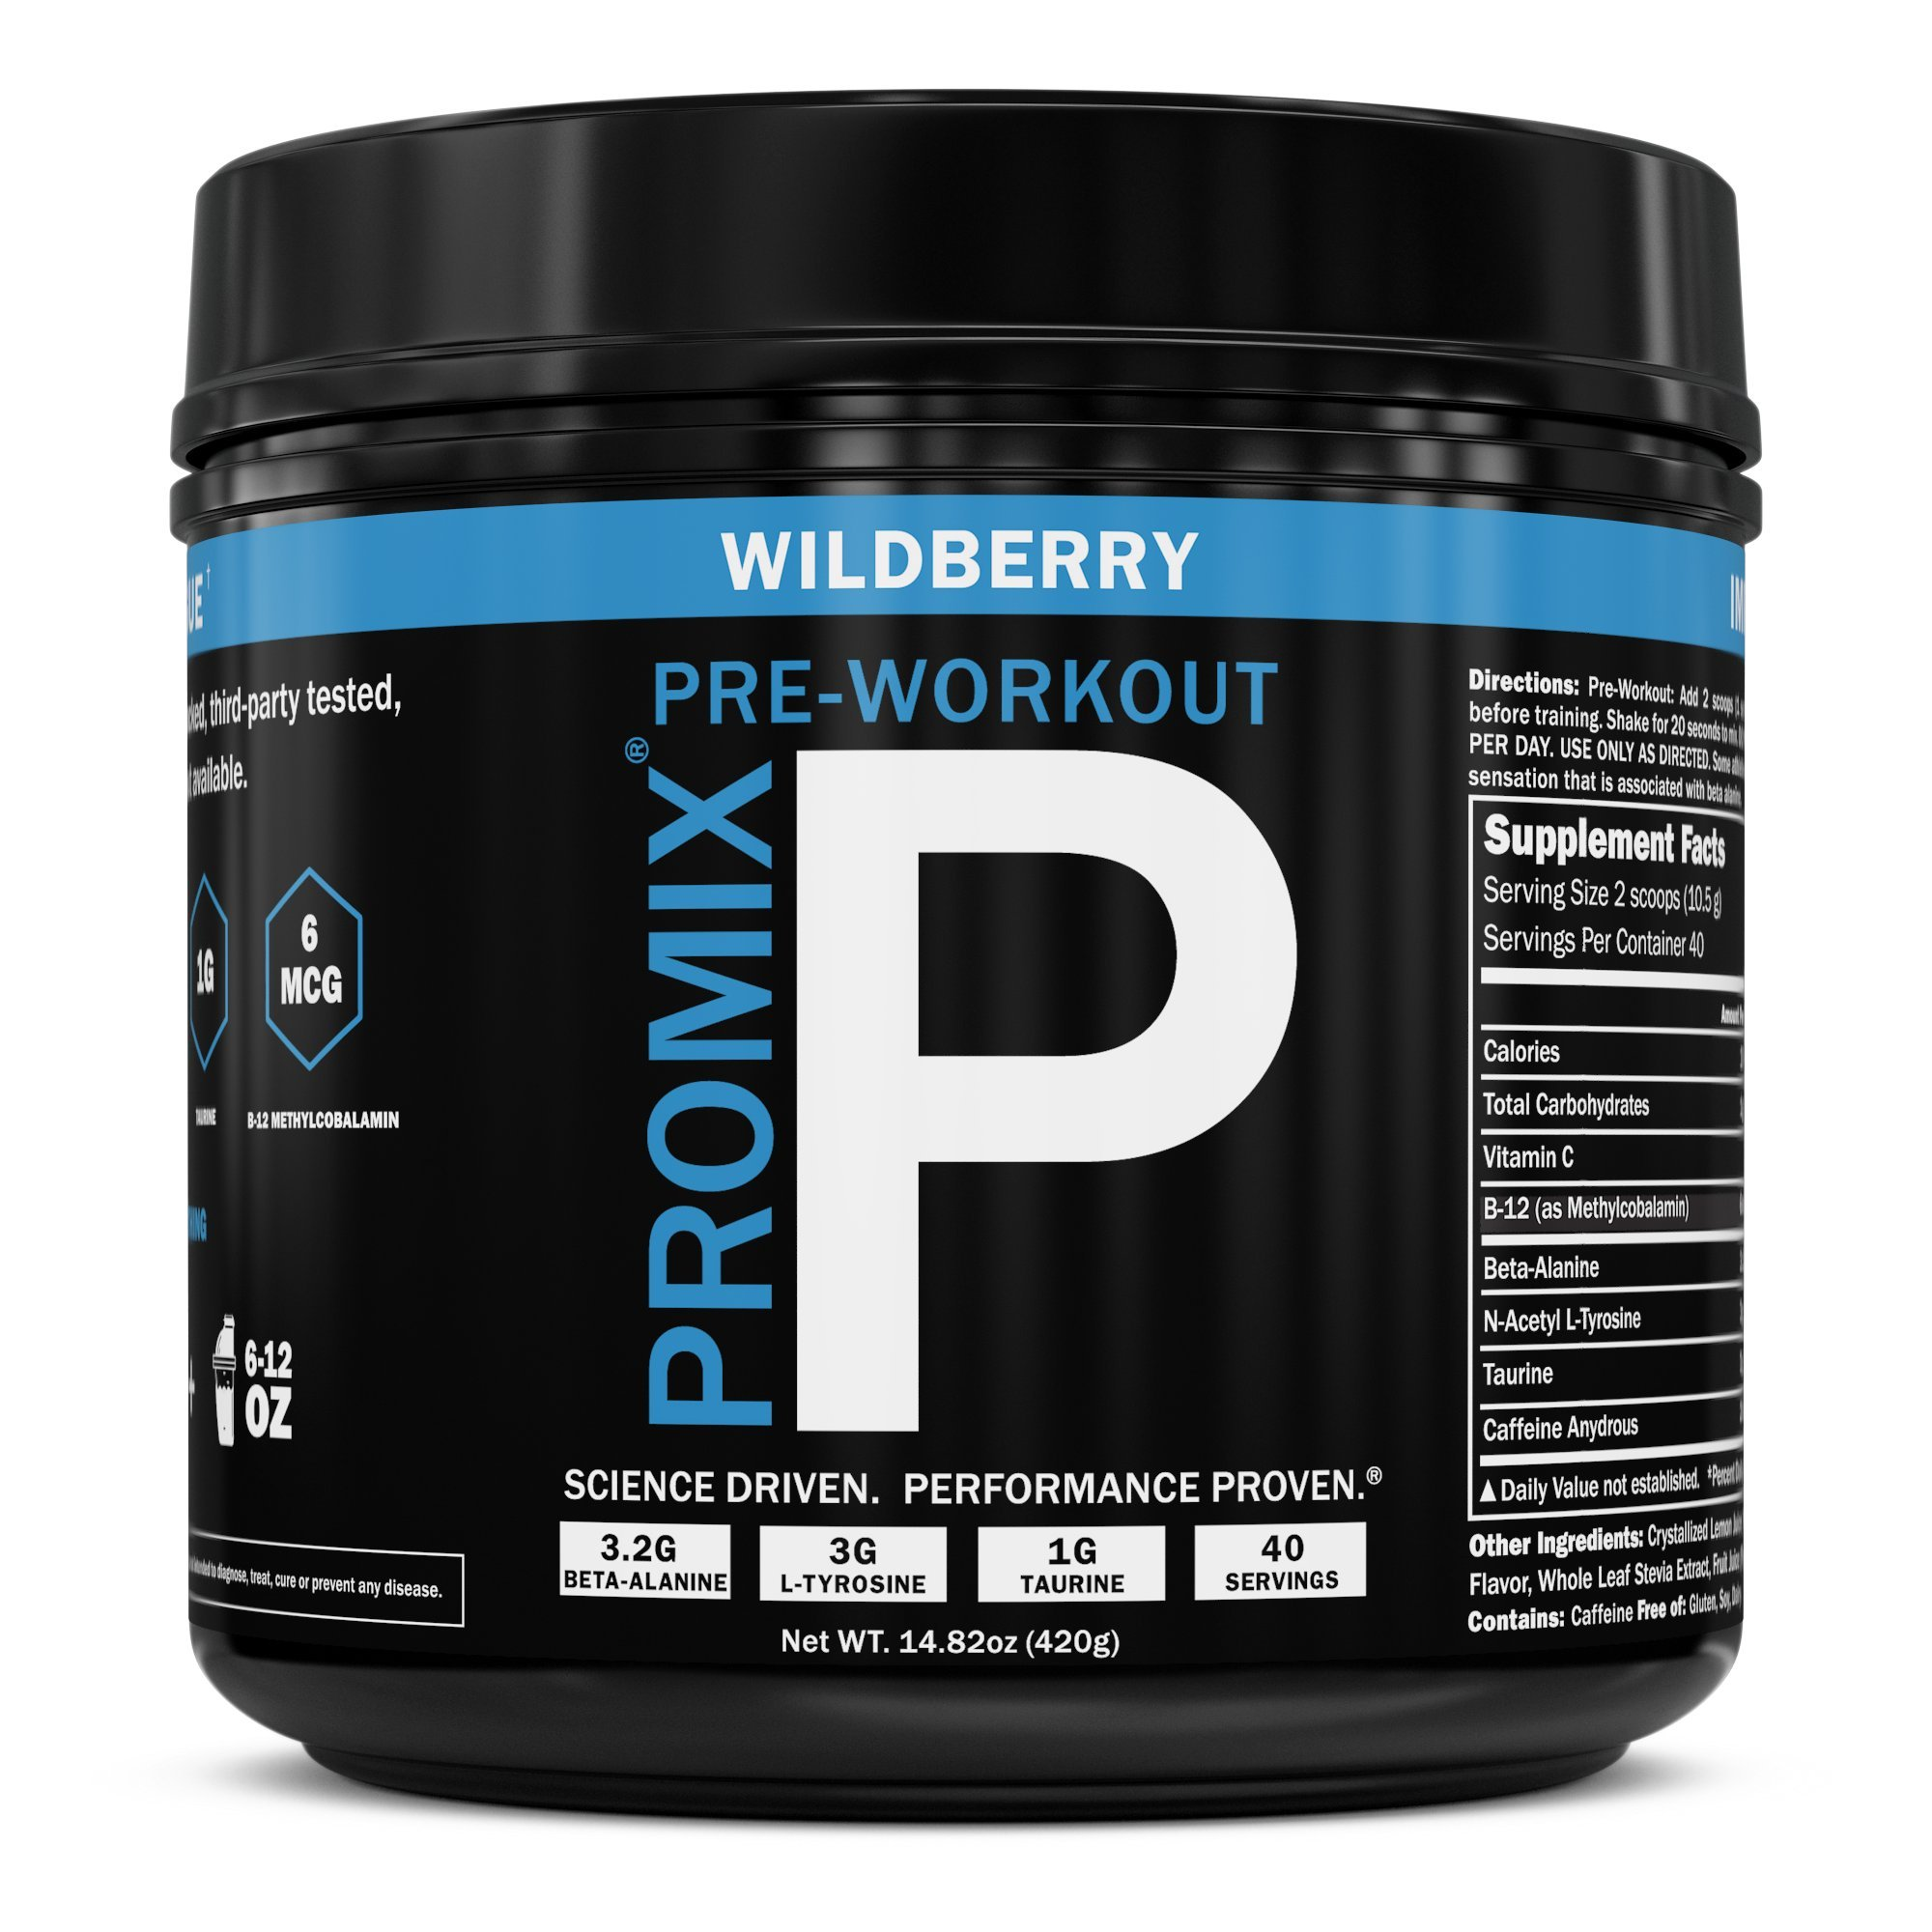 Pre Workout Powder Supplement Natural Energy Focus Keto PROMIX Performance I Men & Women Beta Alanine Taurine Tyrosine Vitamin B12 Weight Fat Loss Blast No Crash Tested Gluten Soy Free Wild Berry